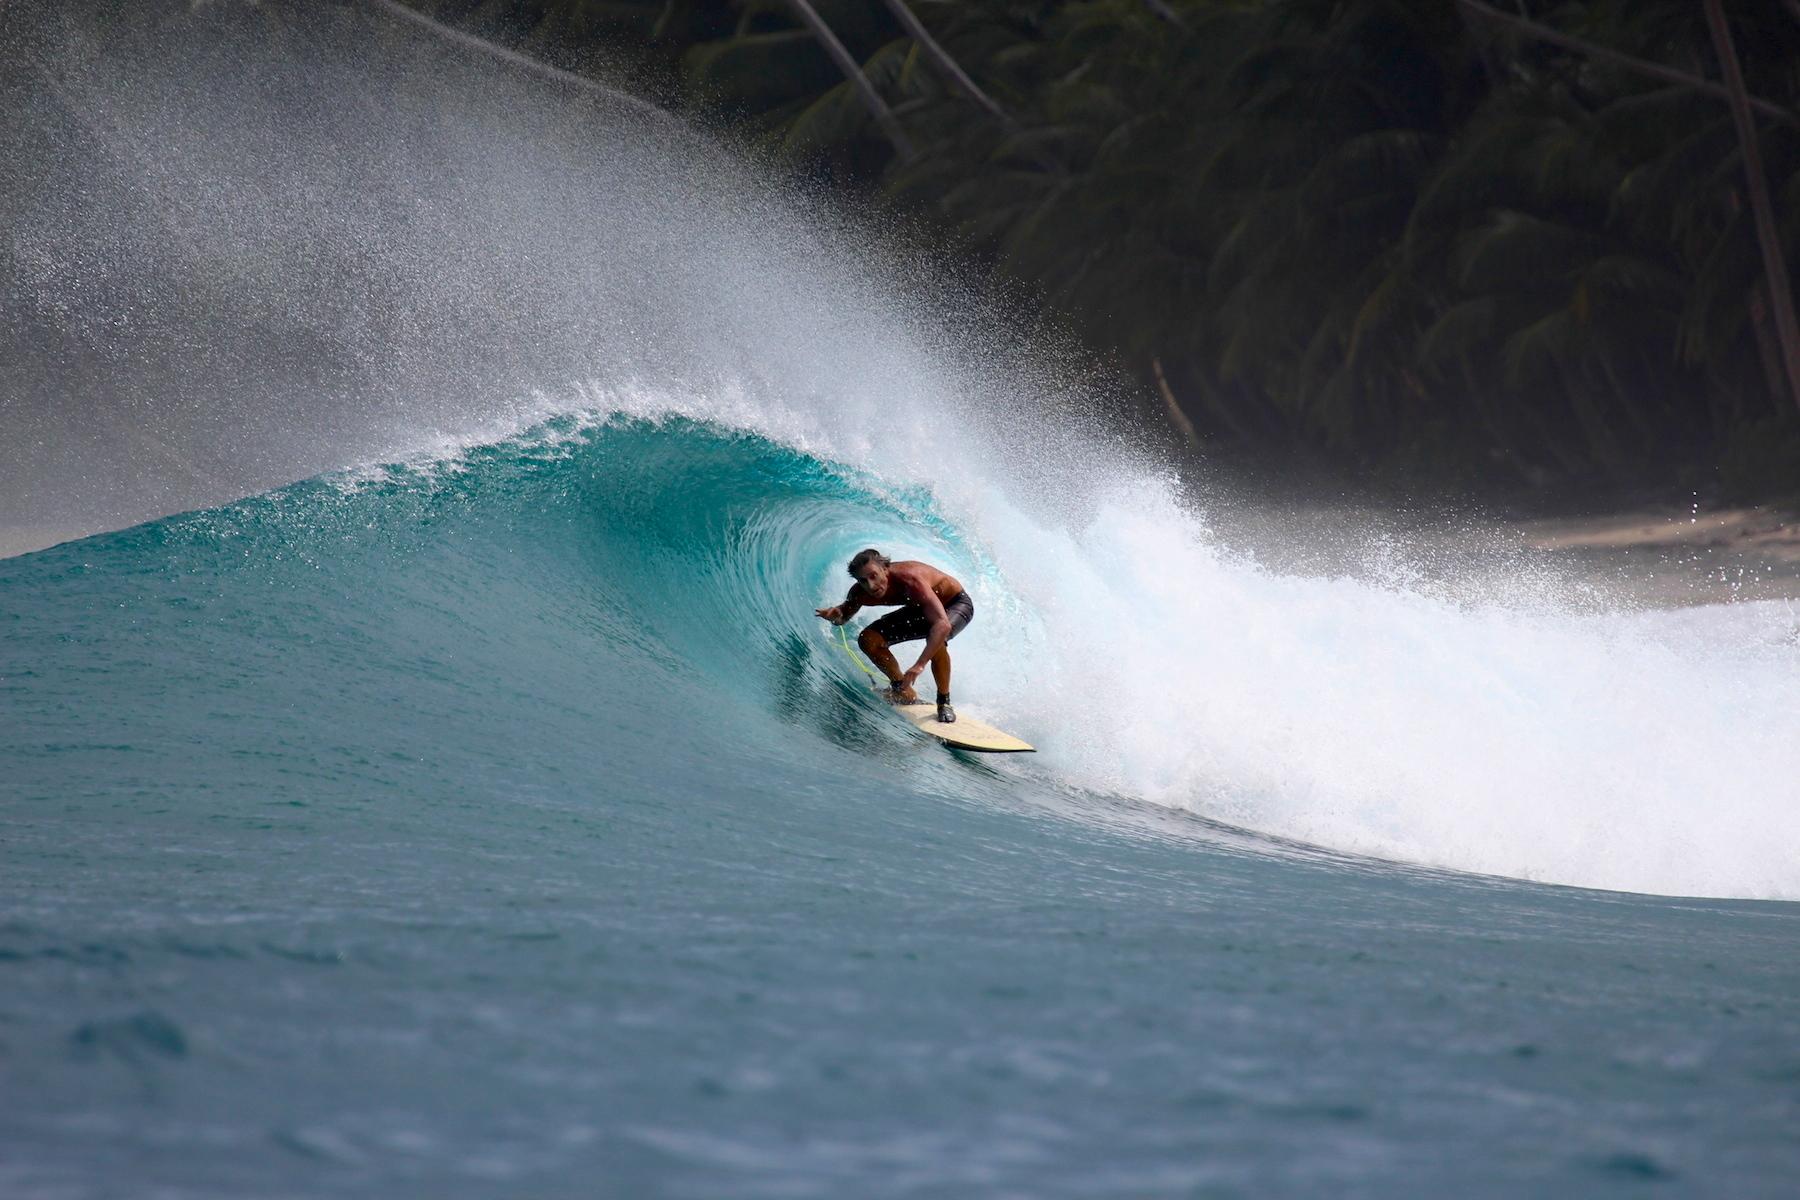 rlz, resort latitude, latitude zero, Telo Islands, Sumatra, Indonesia, Nomad, Mangalui